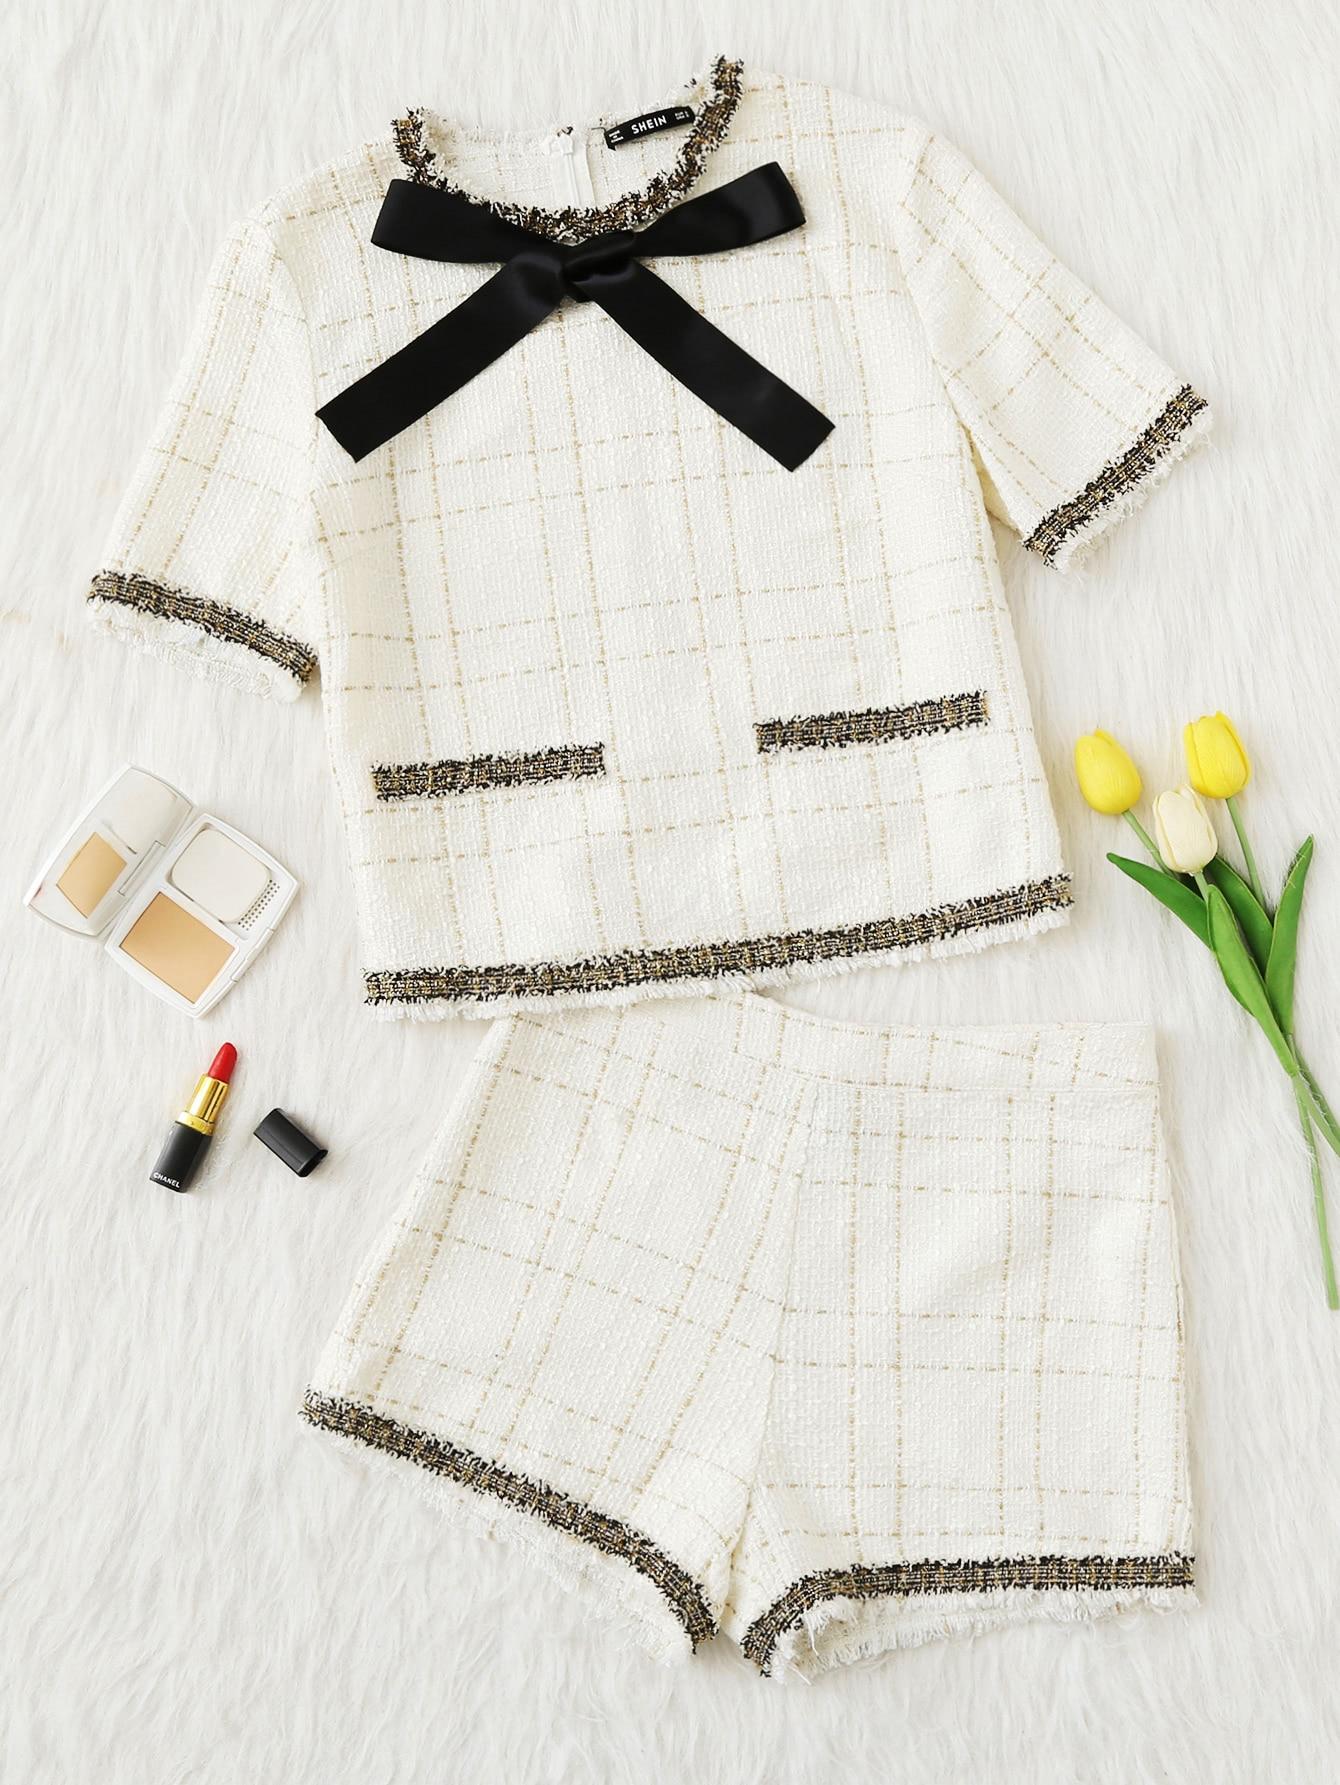 Frayed Tape Applique Tweed Top & Shorts Set frayed trim houndstooth tweed dress